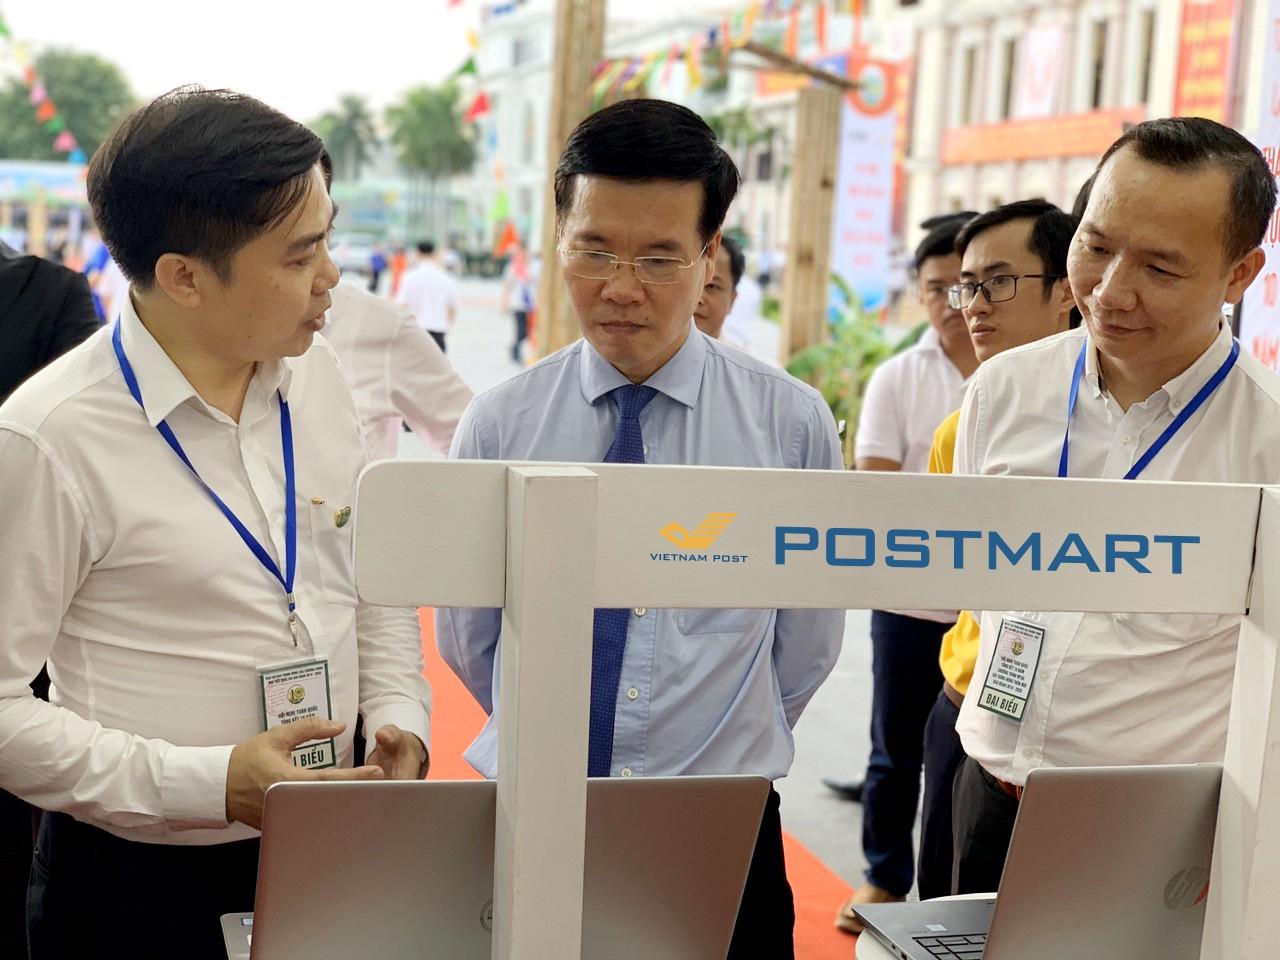 postmart 1